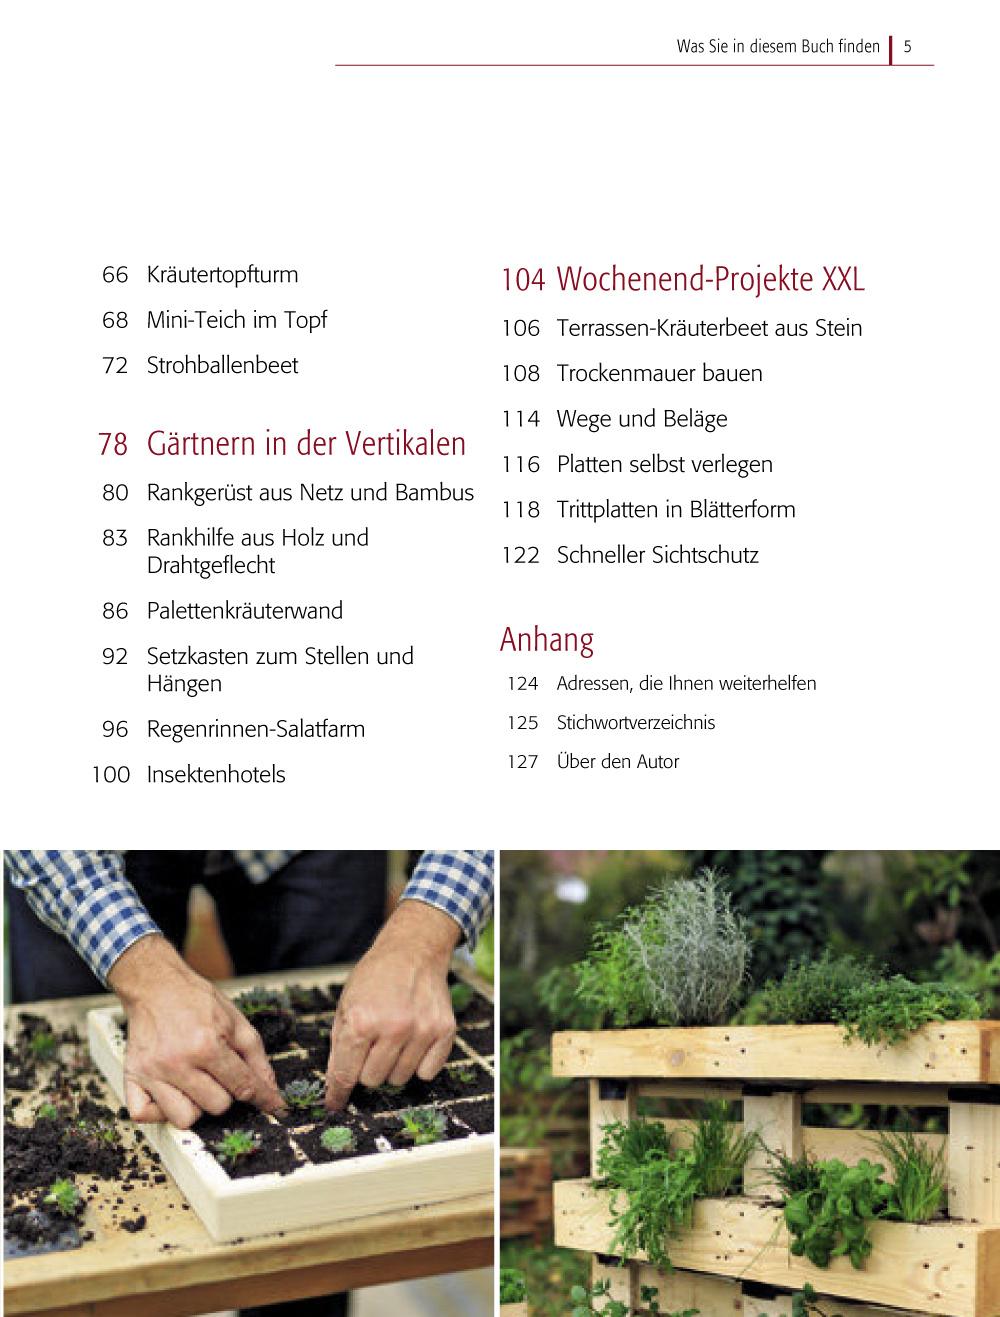 Hochbeet Pflanztisch Gartentisch Balkongarten Krauterbeet